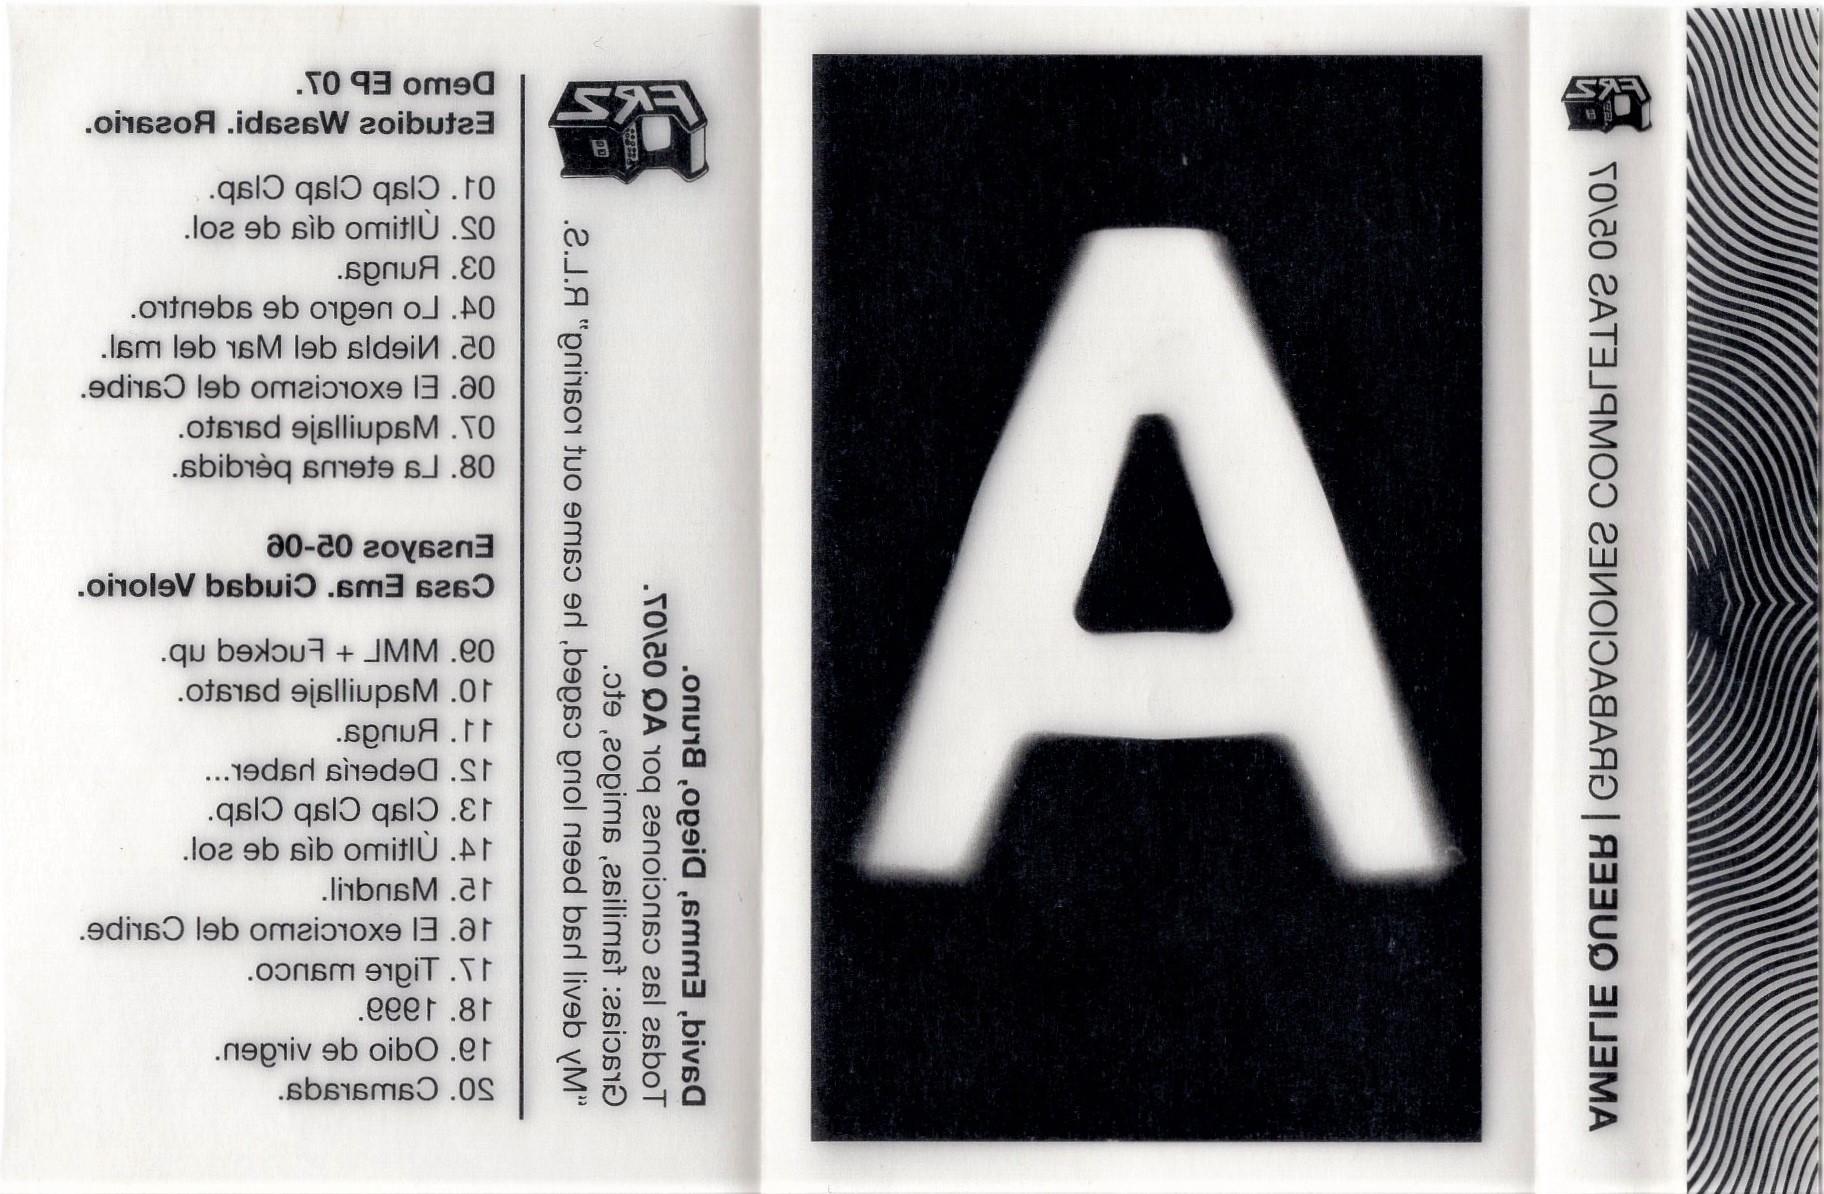 AQ inlet back.jpg